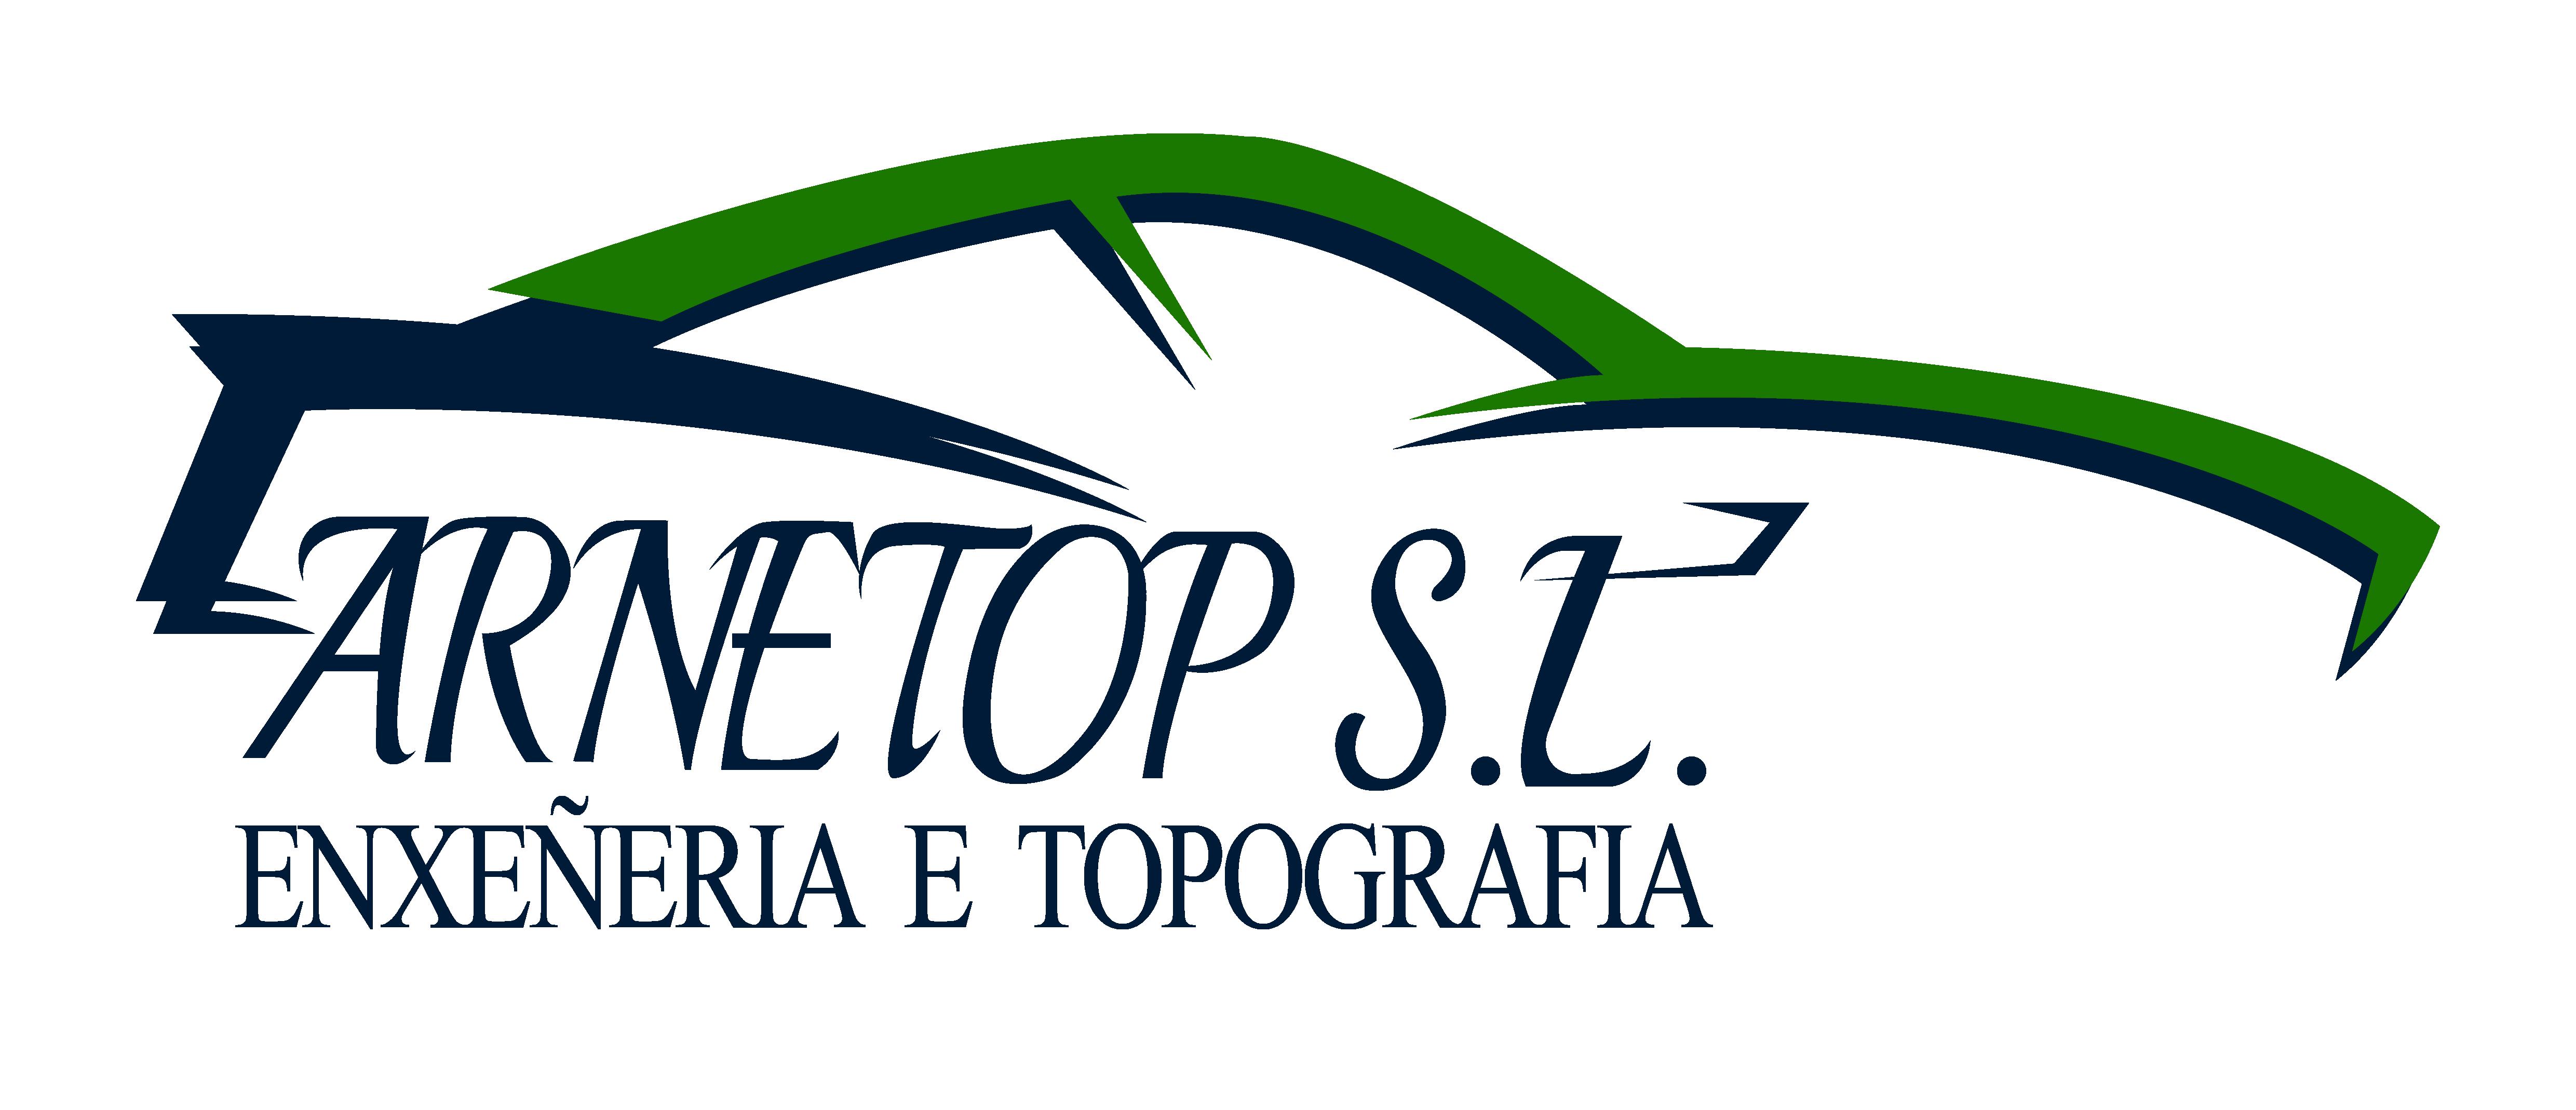 Arnetop